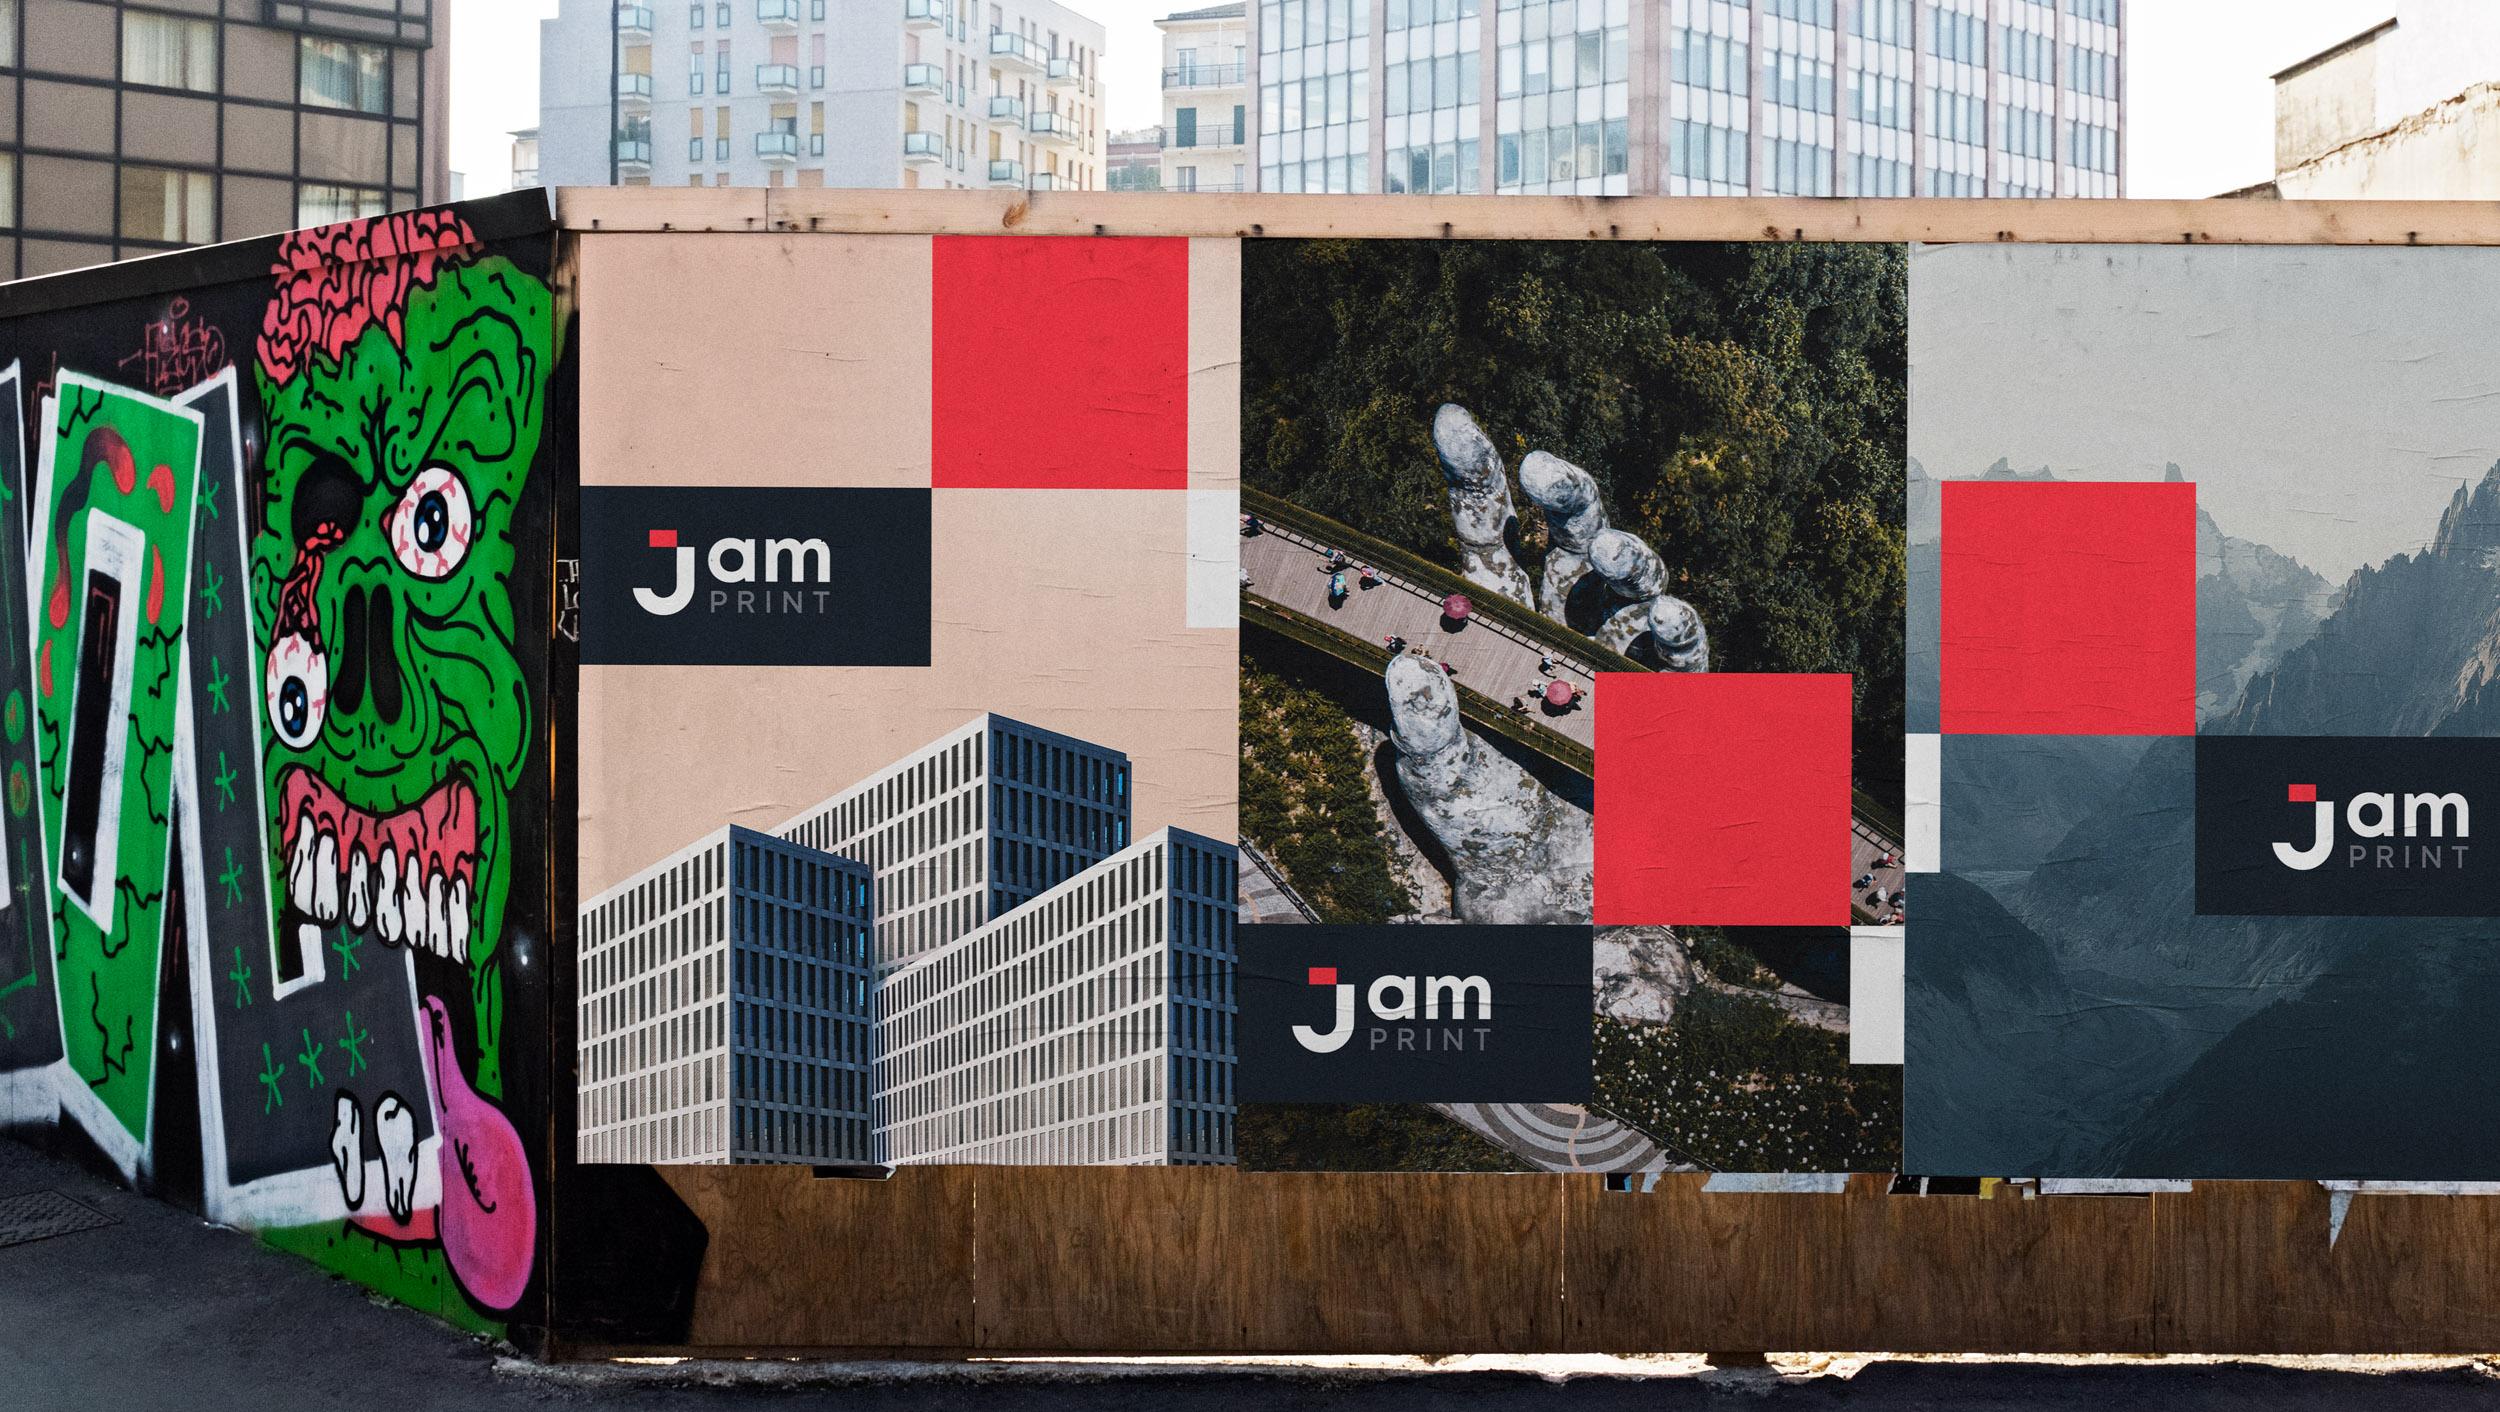 Jam Print Poster Design